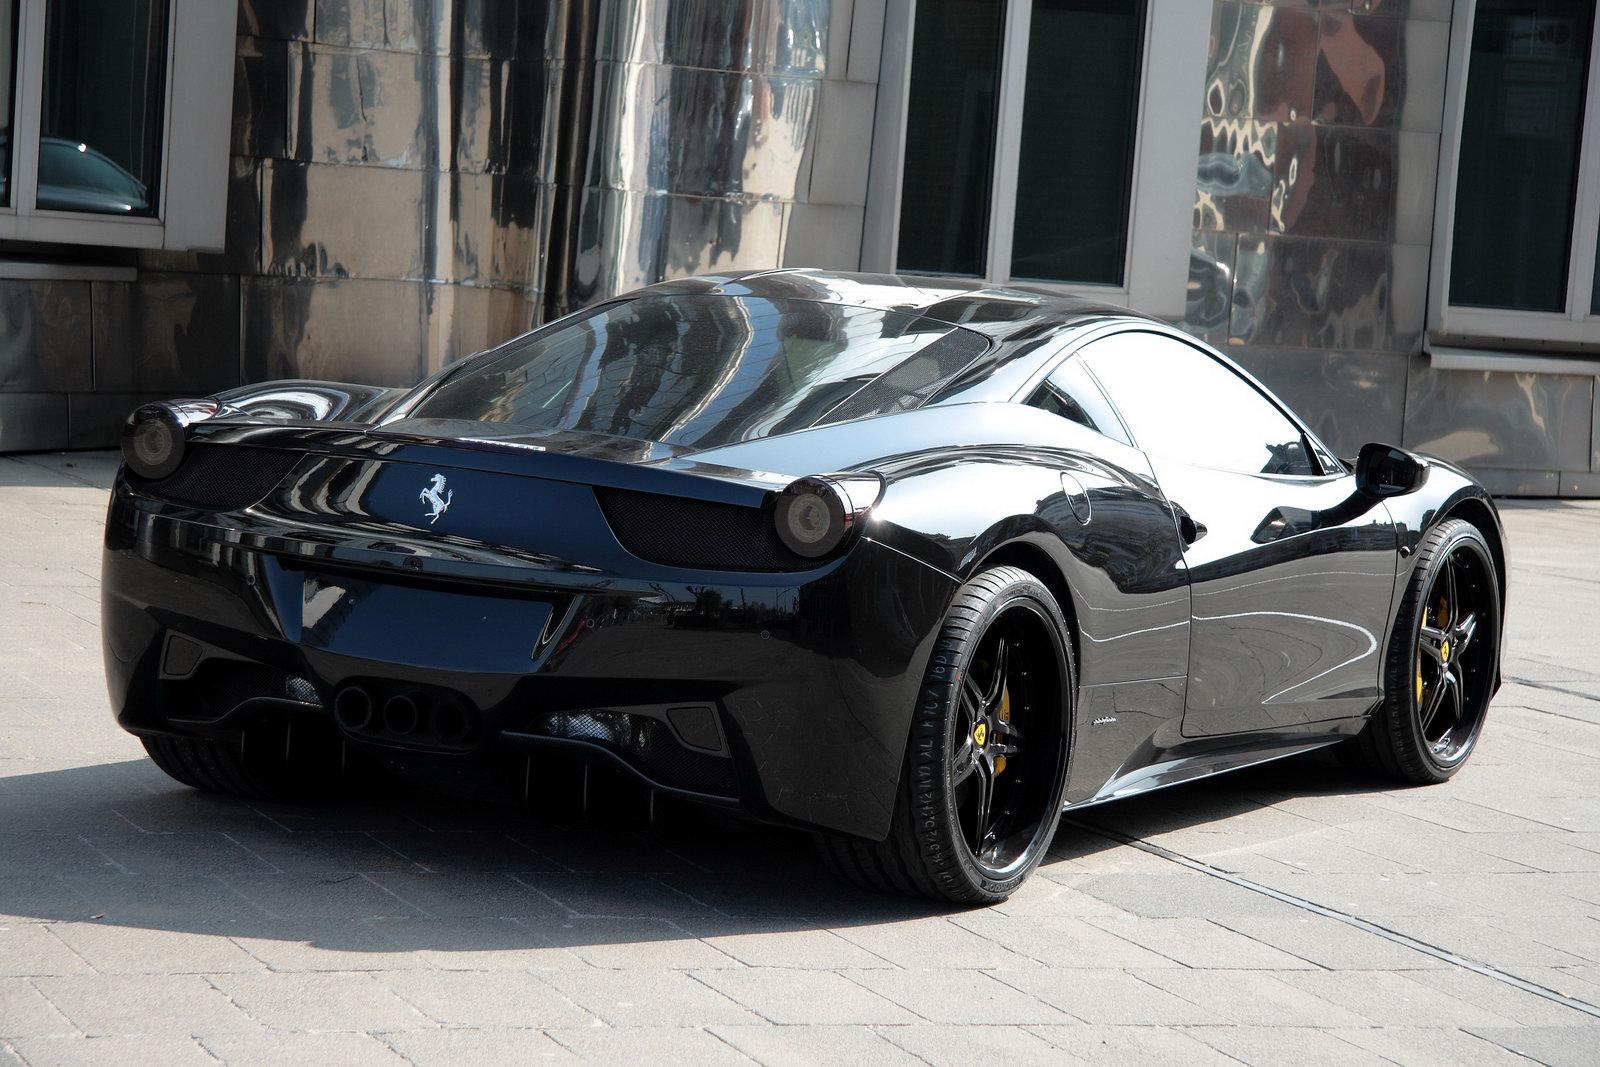 Ferrari 458 Black Carbon Edition Is Darth Vader's Supercar ...